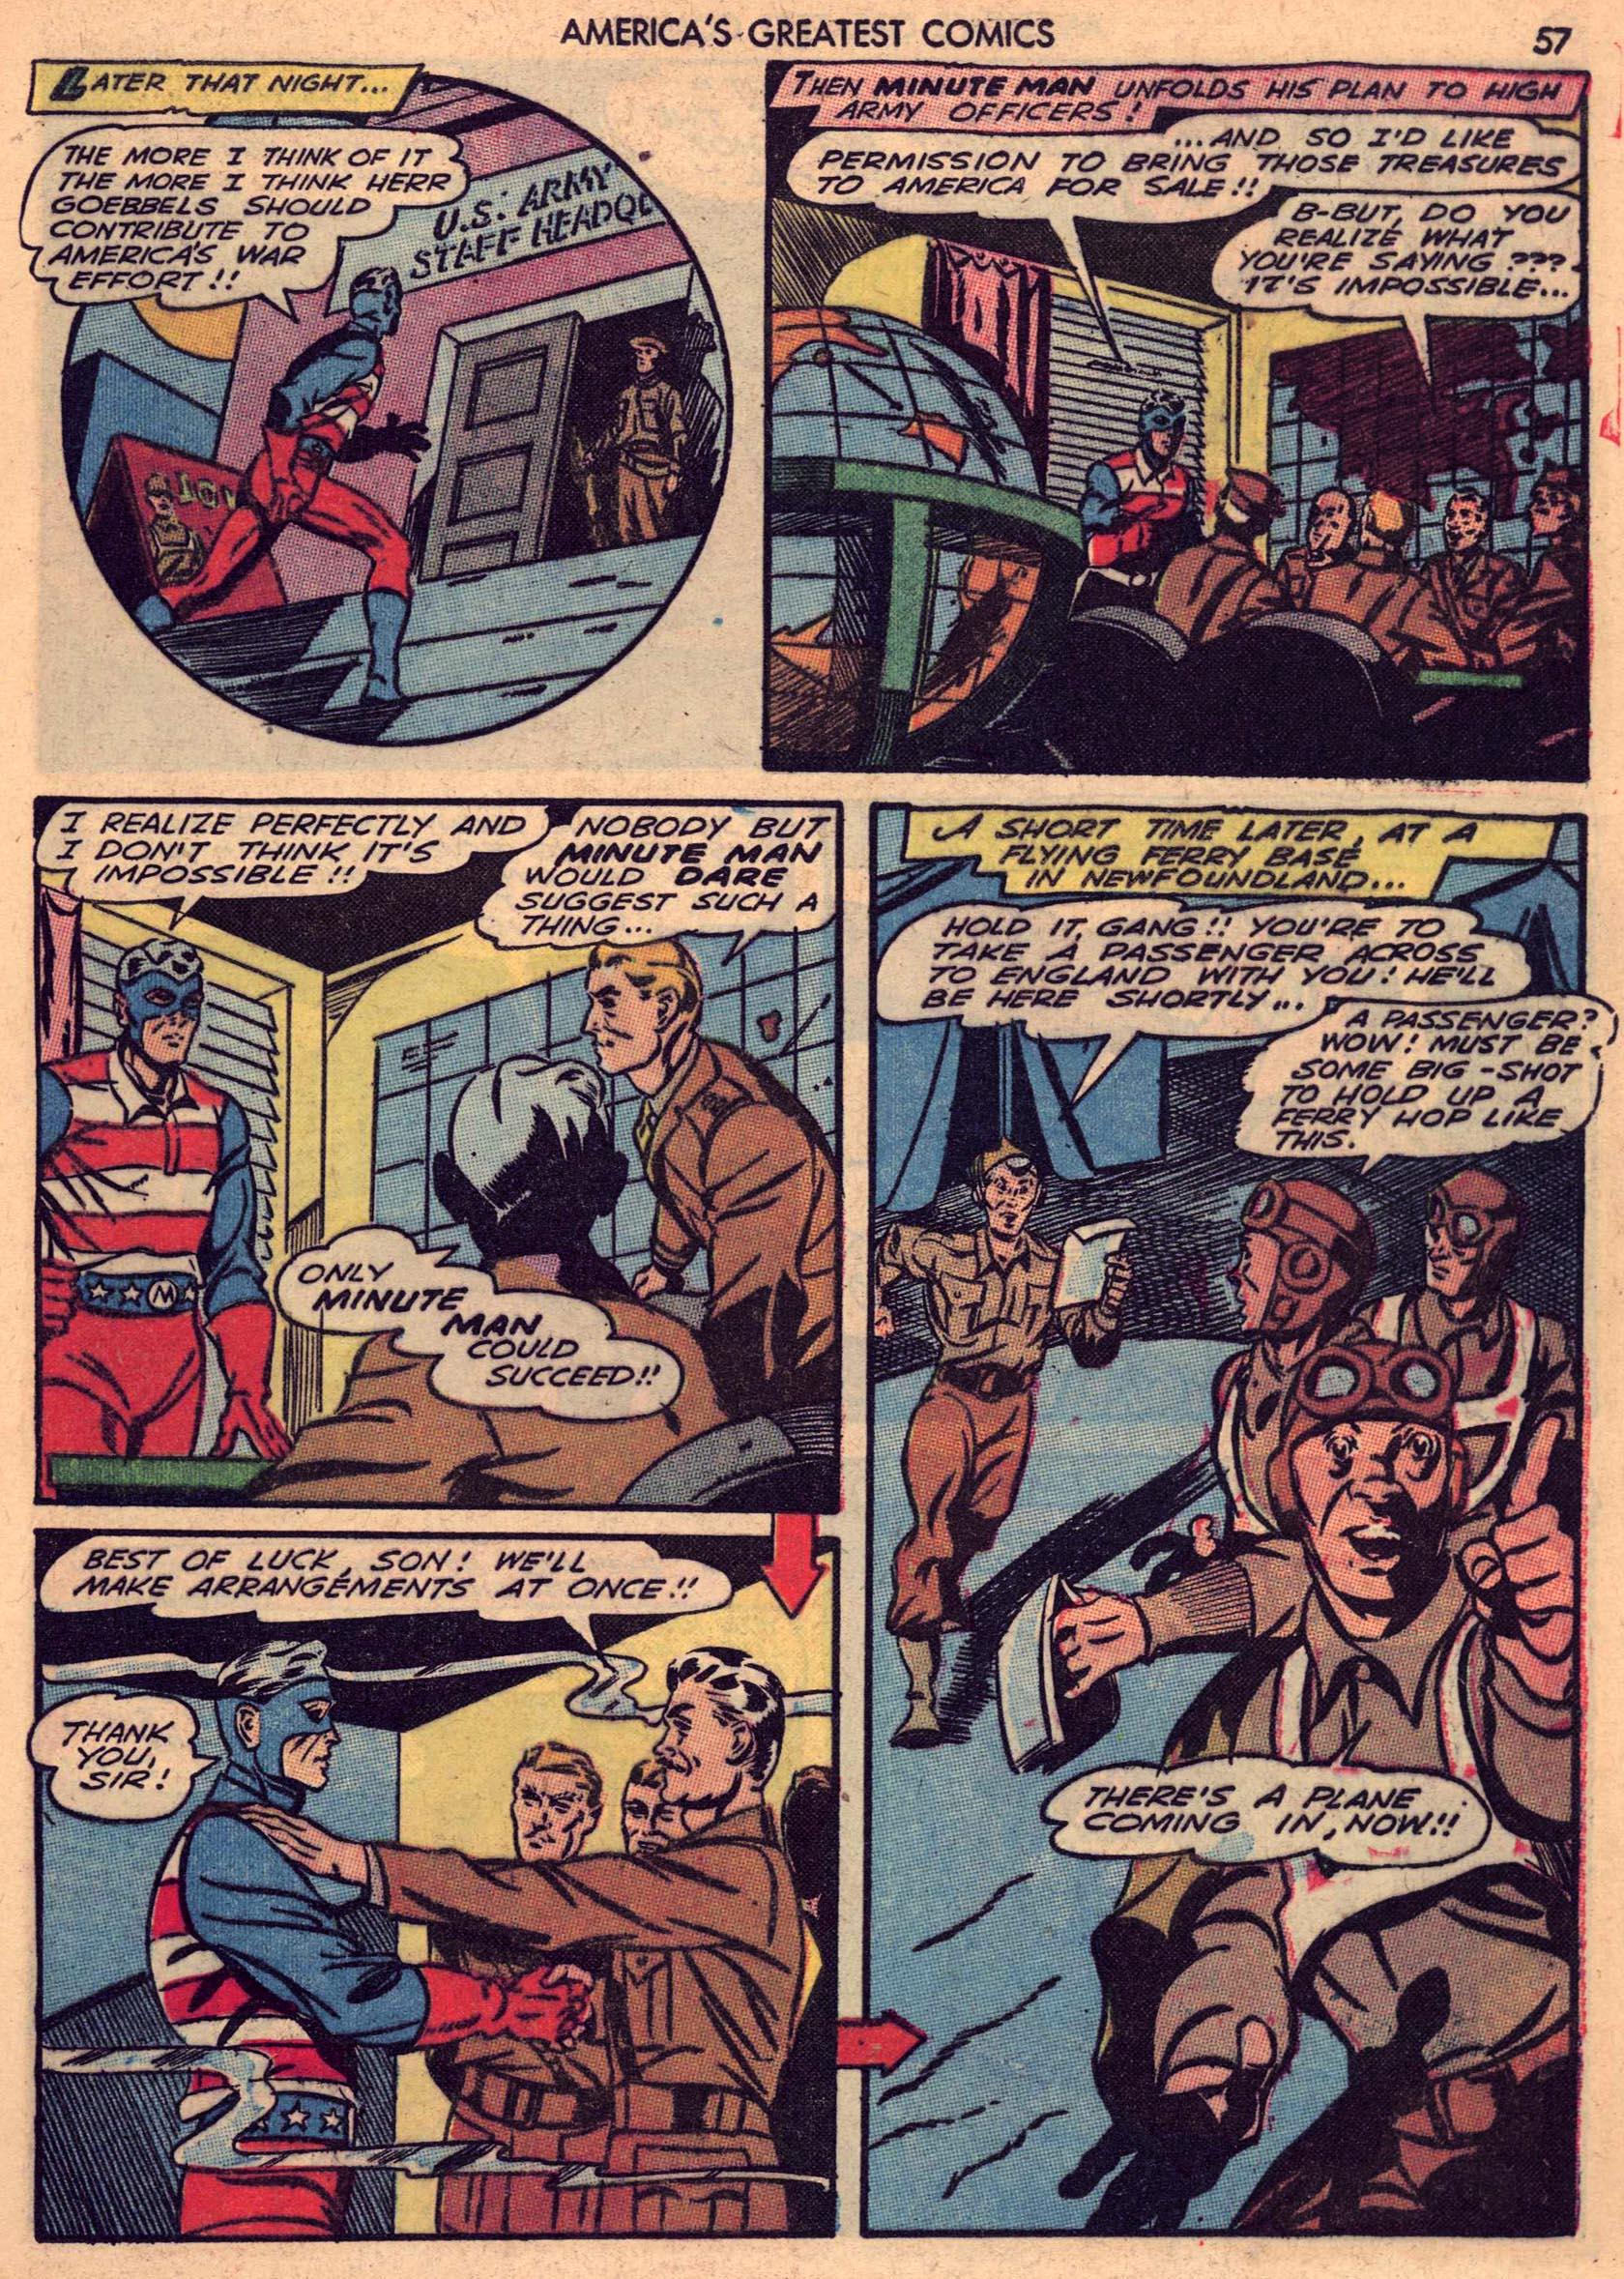 Read online America's Greatest Comics comic -  Issue #7 - 56